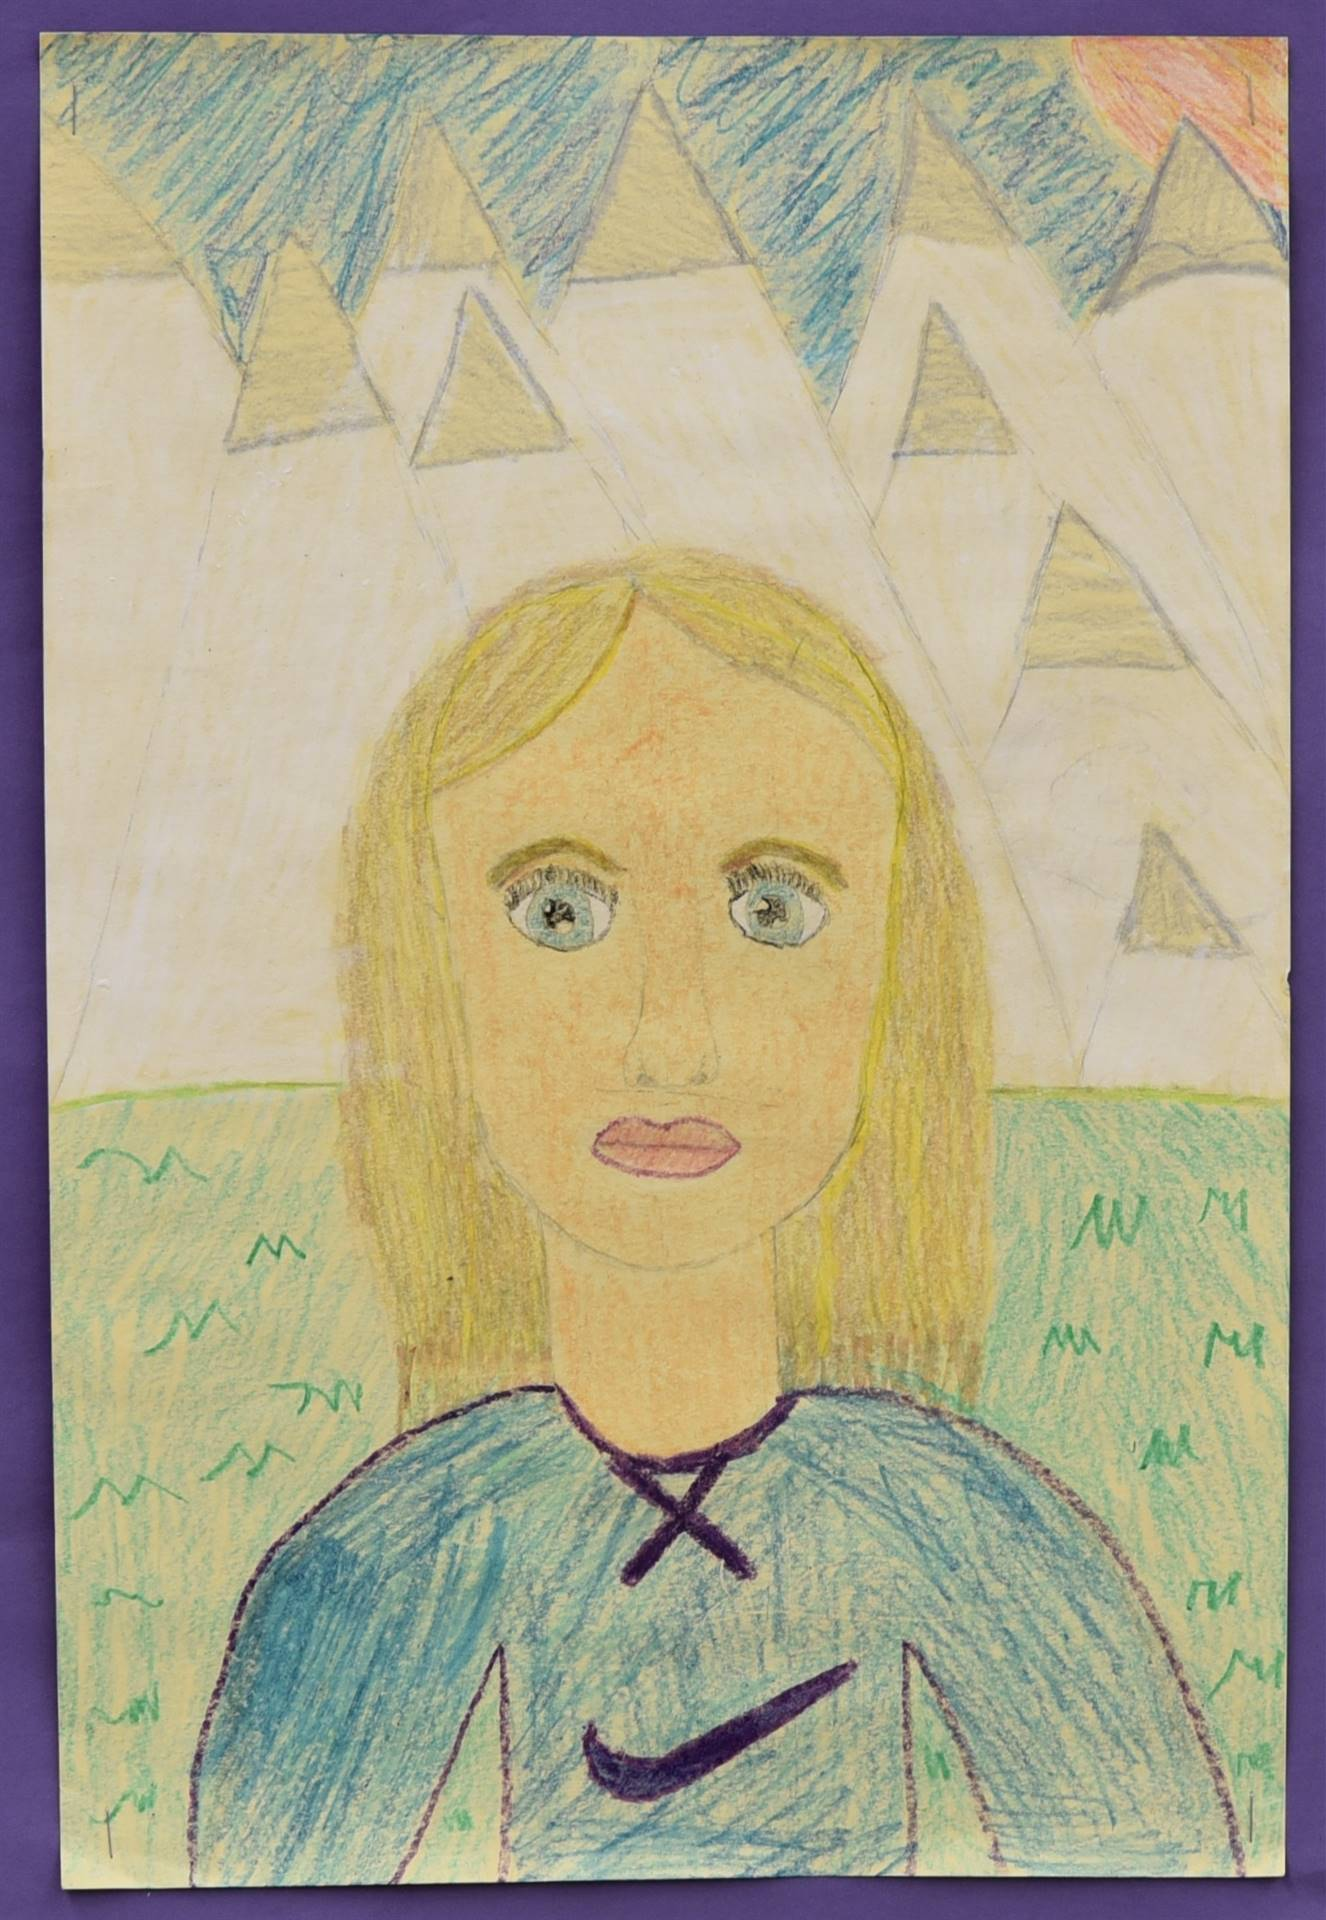 Brecksville-Broadview Hts. Middle School Art Projects 187